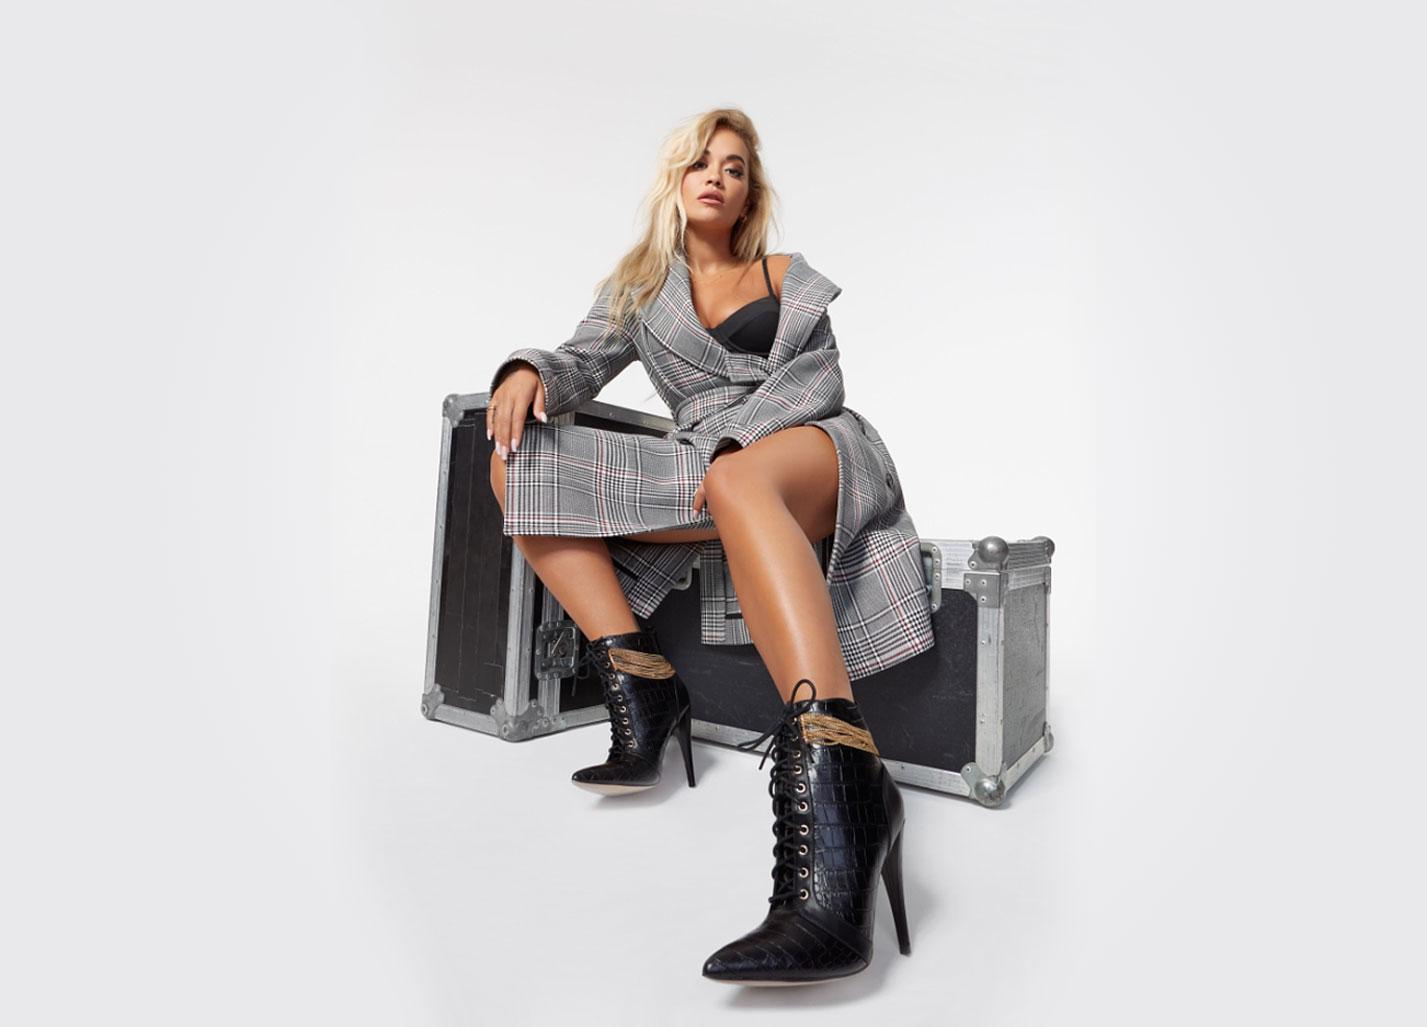 Рита Ора в обуви модного бренда ShoeDazzle, сезон 2020 / фото 01